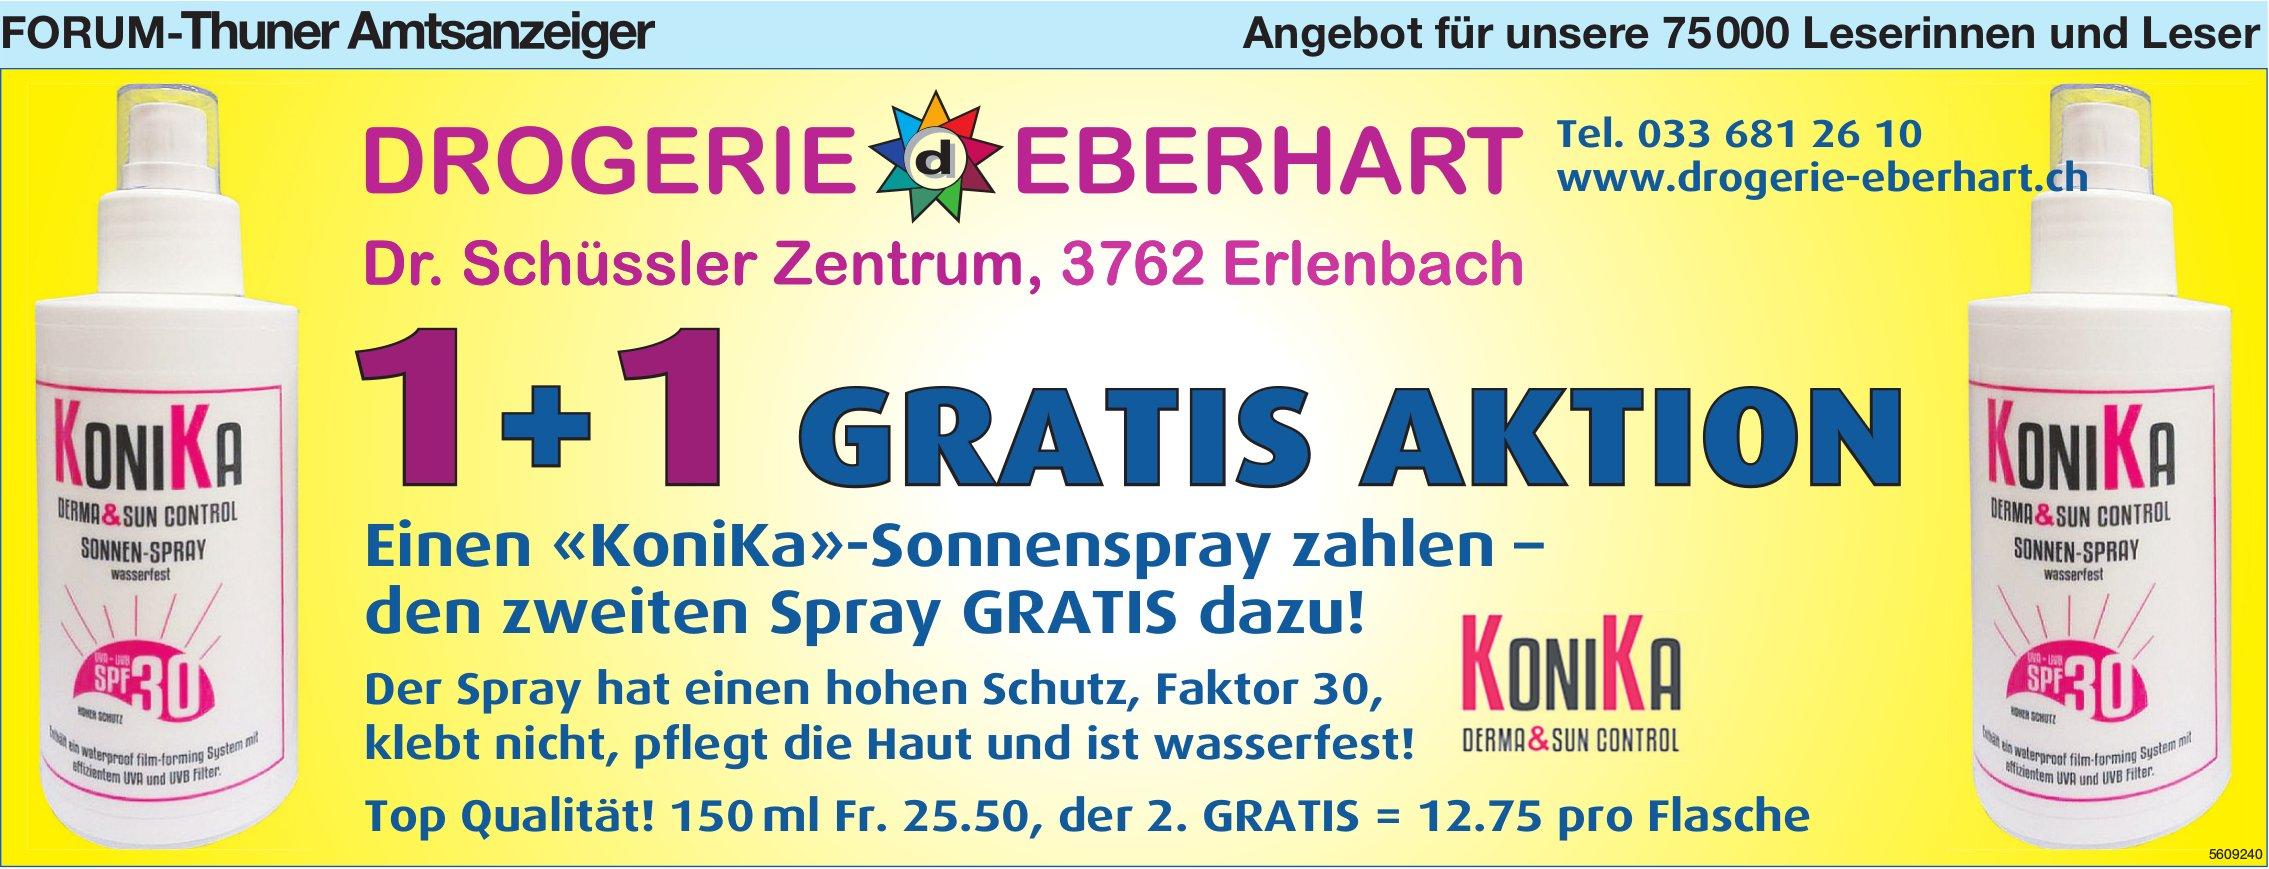 Forum-Thuner Amtsanzeiger - Drogerie Eberhart: 1 «KoniKa»-Sonnenspray zahlen den  2. Spray GRATIS